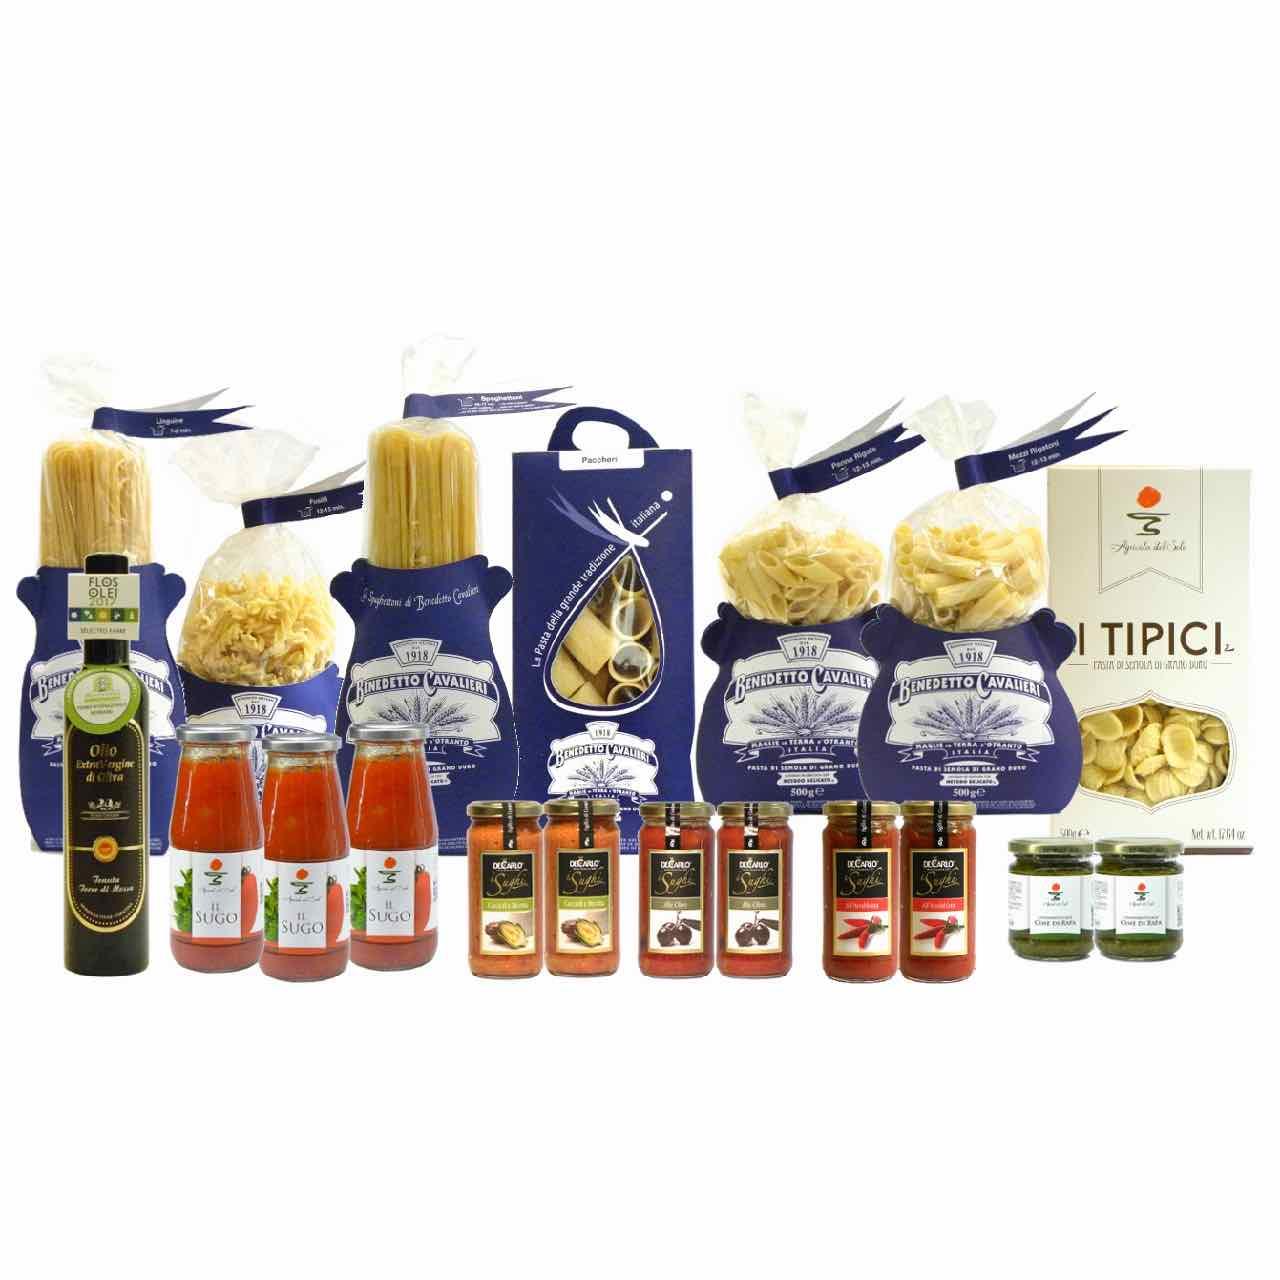 Confezione dispensa pasta classica –  Pantry Cavalieri Pasta Sauces EVO Oil – Gustorotondo Italian food boutique – I migliori cibi online – Best Italian foods online – spesa online